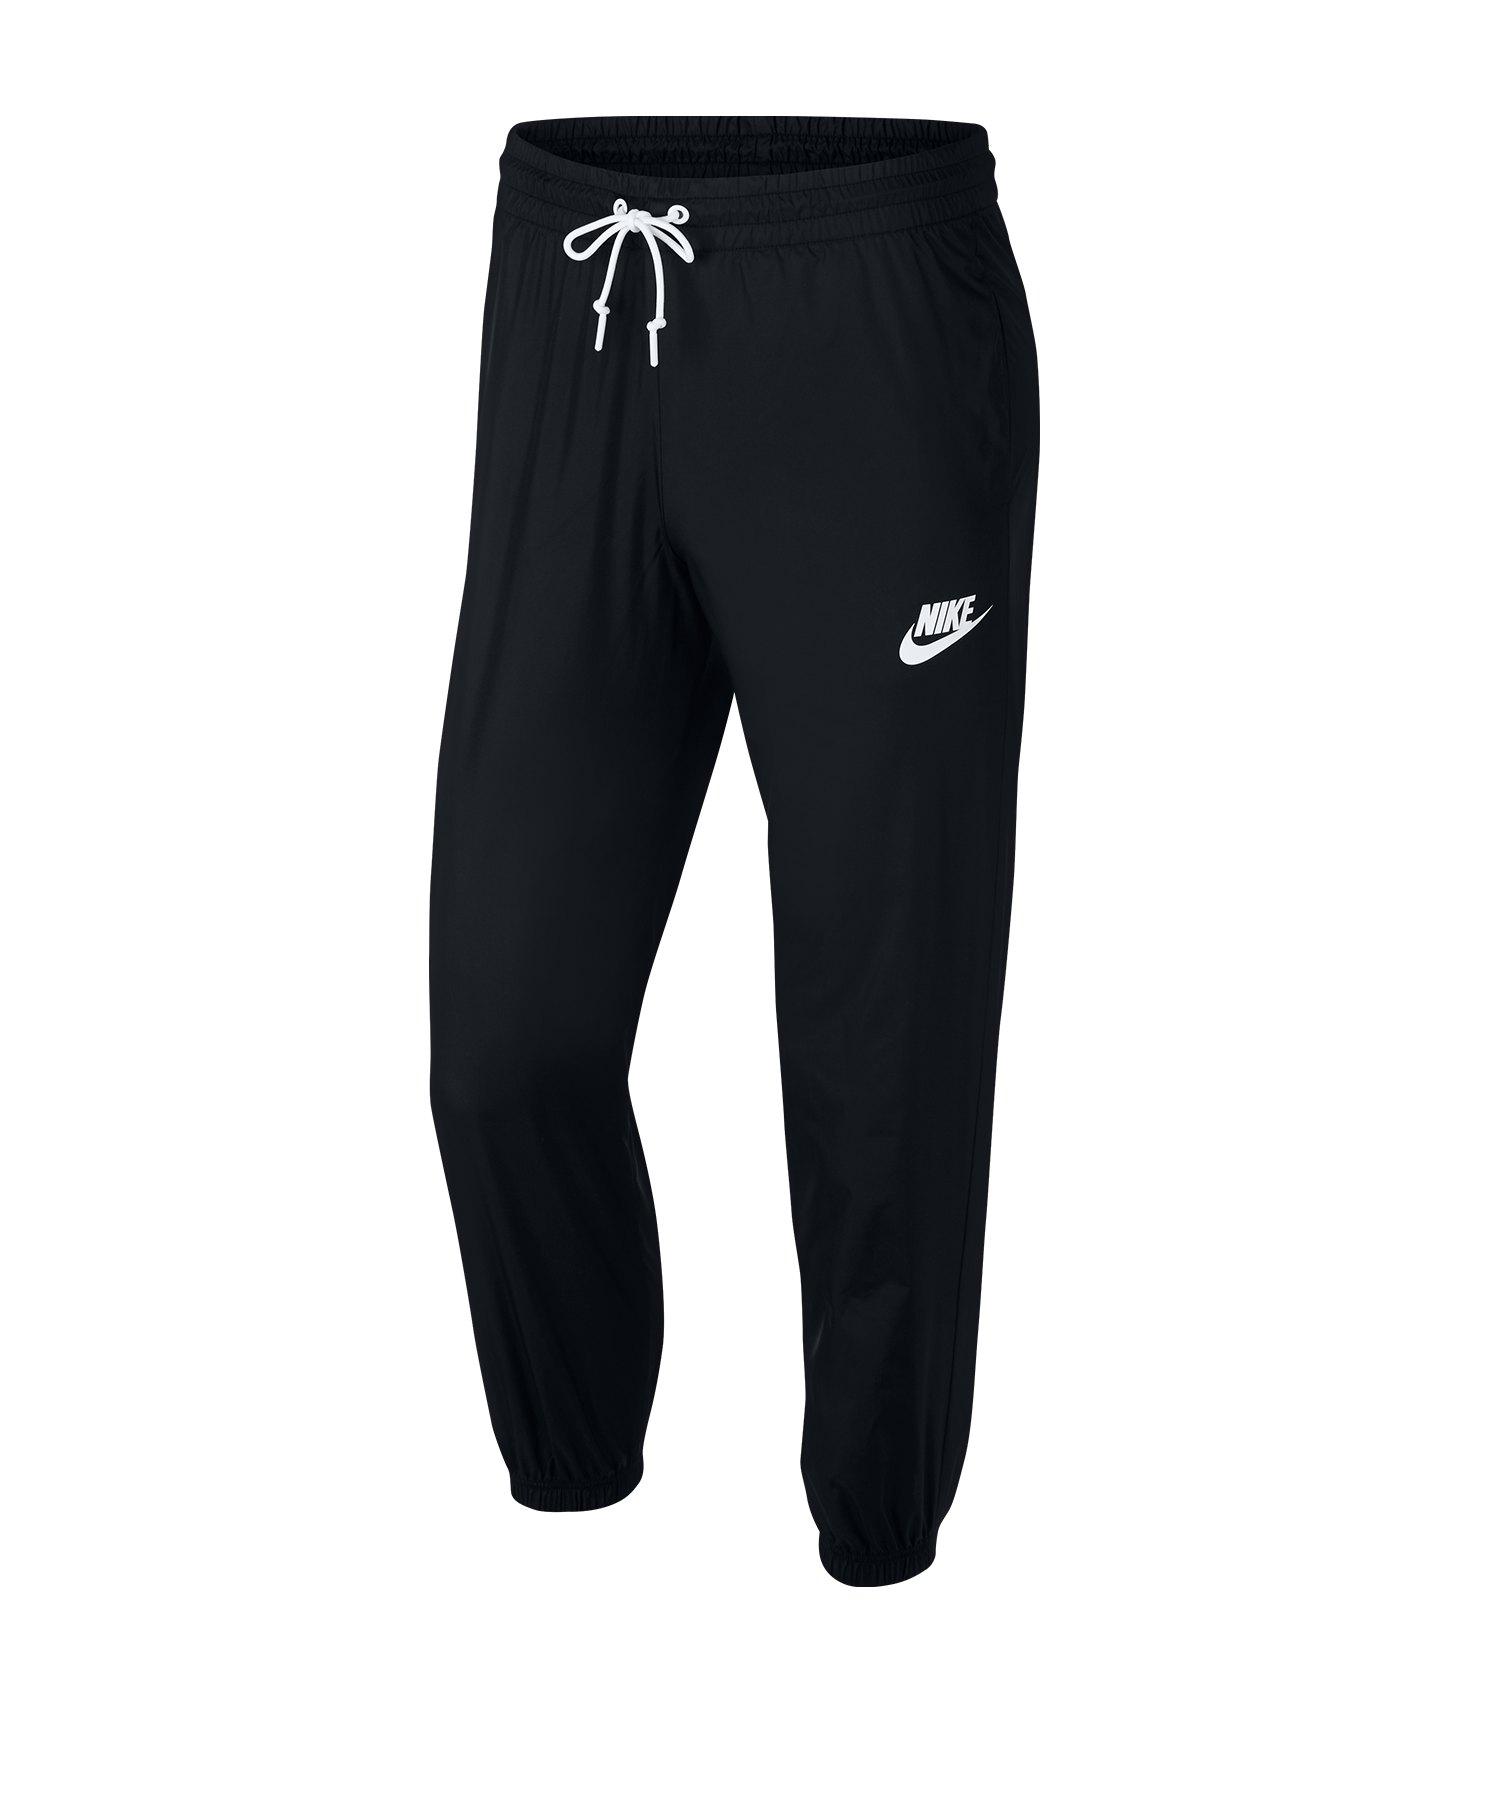 Nike Woven Pant Hose Damen Schwarz F010 - schwarz